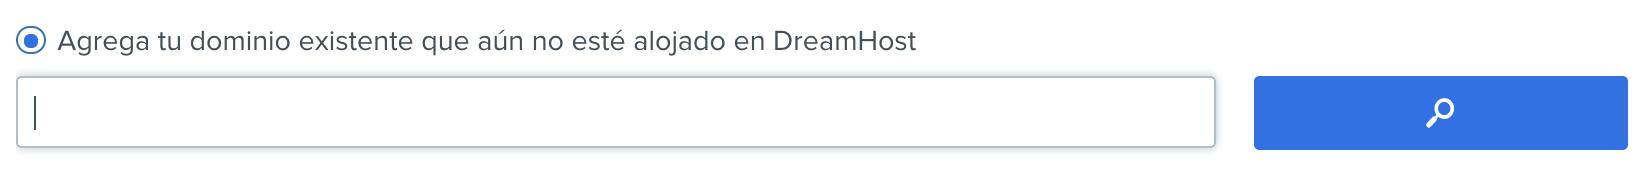 es-panel-add-dreampress-03.png